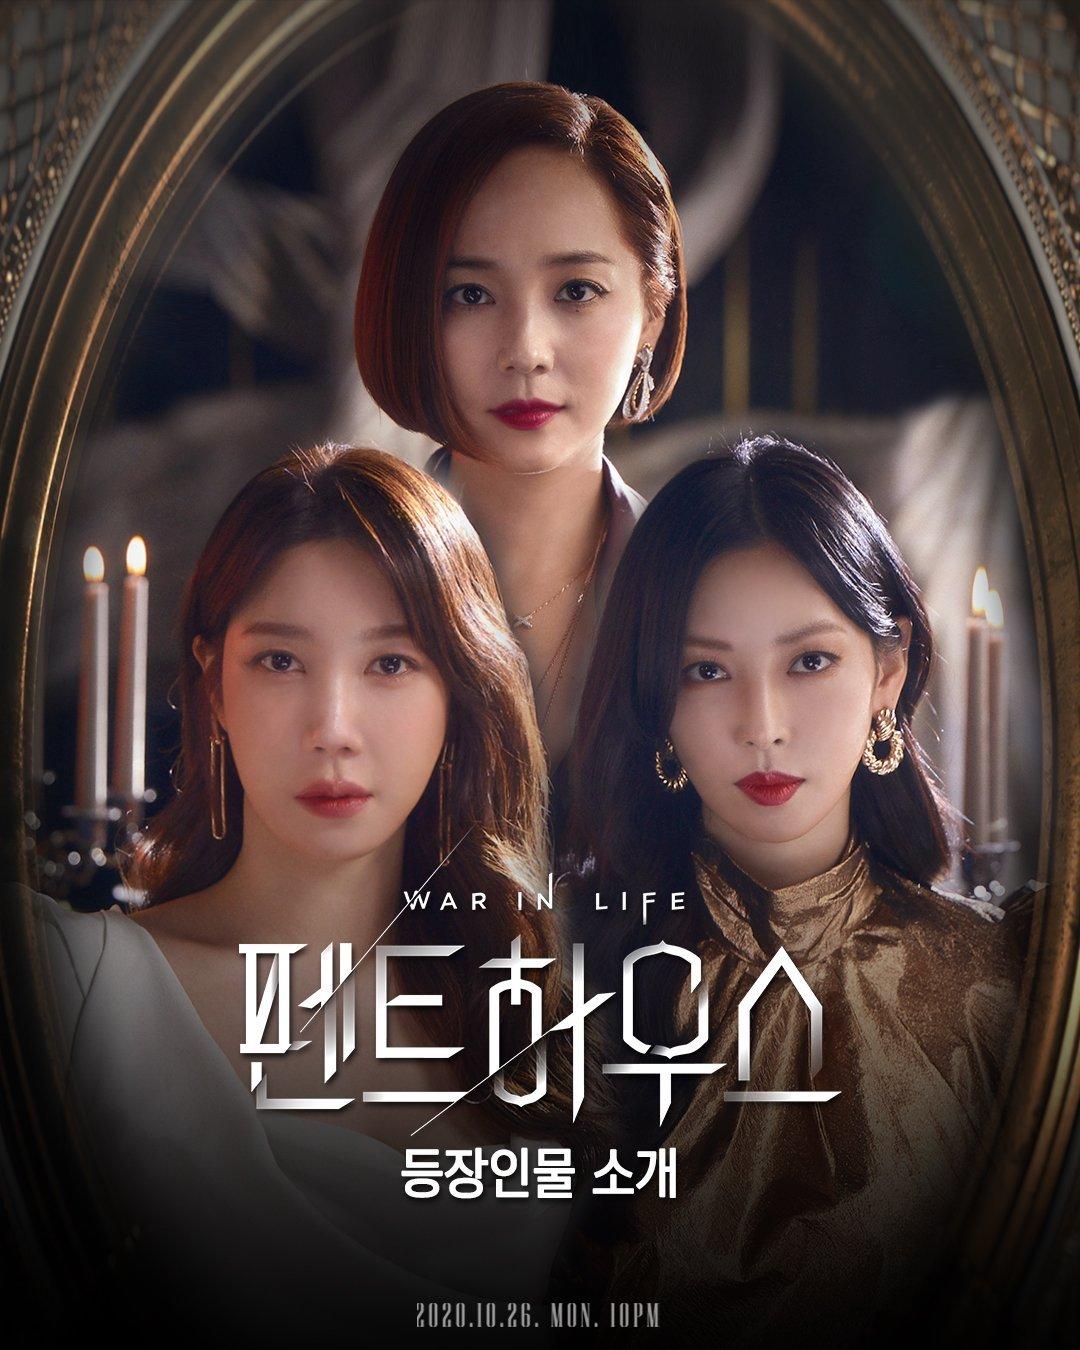 DOWNLOAD: Penthouse (2020) Season 1 Episode 1 – 9 [Korean Drama]